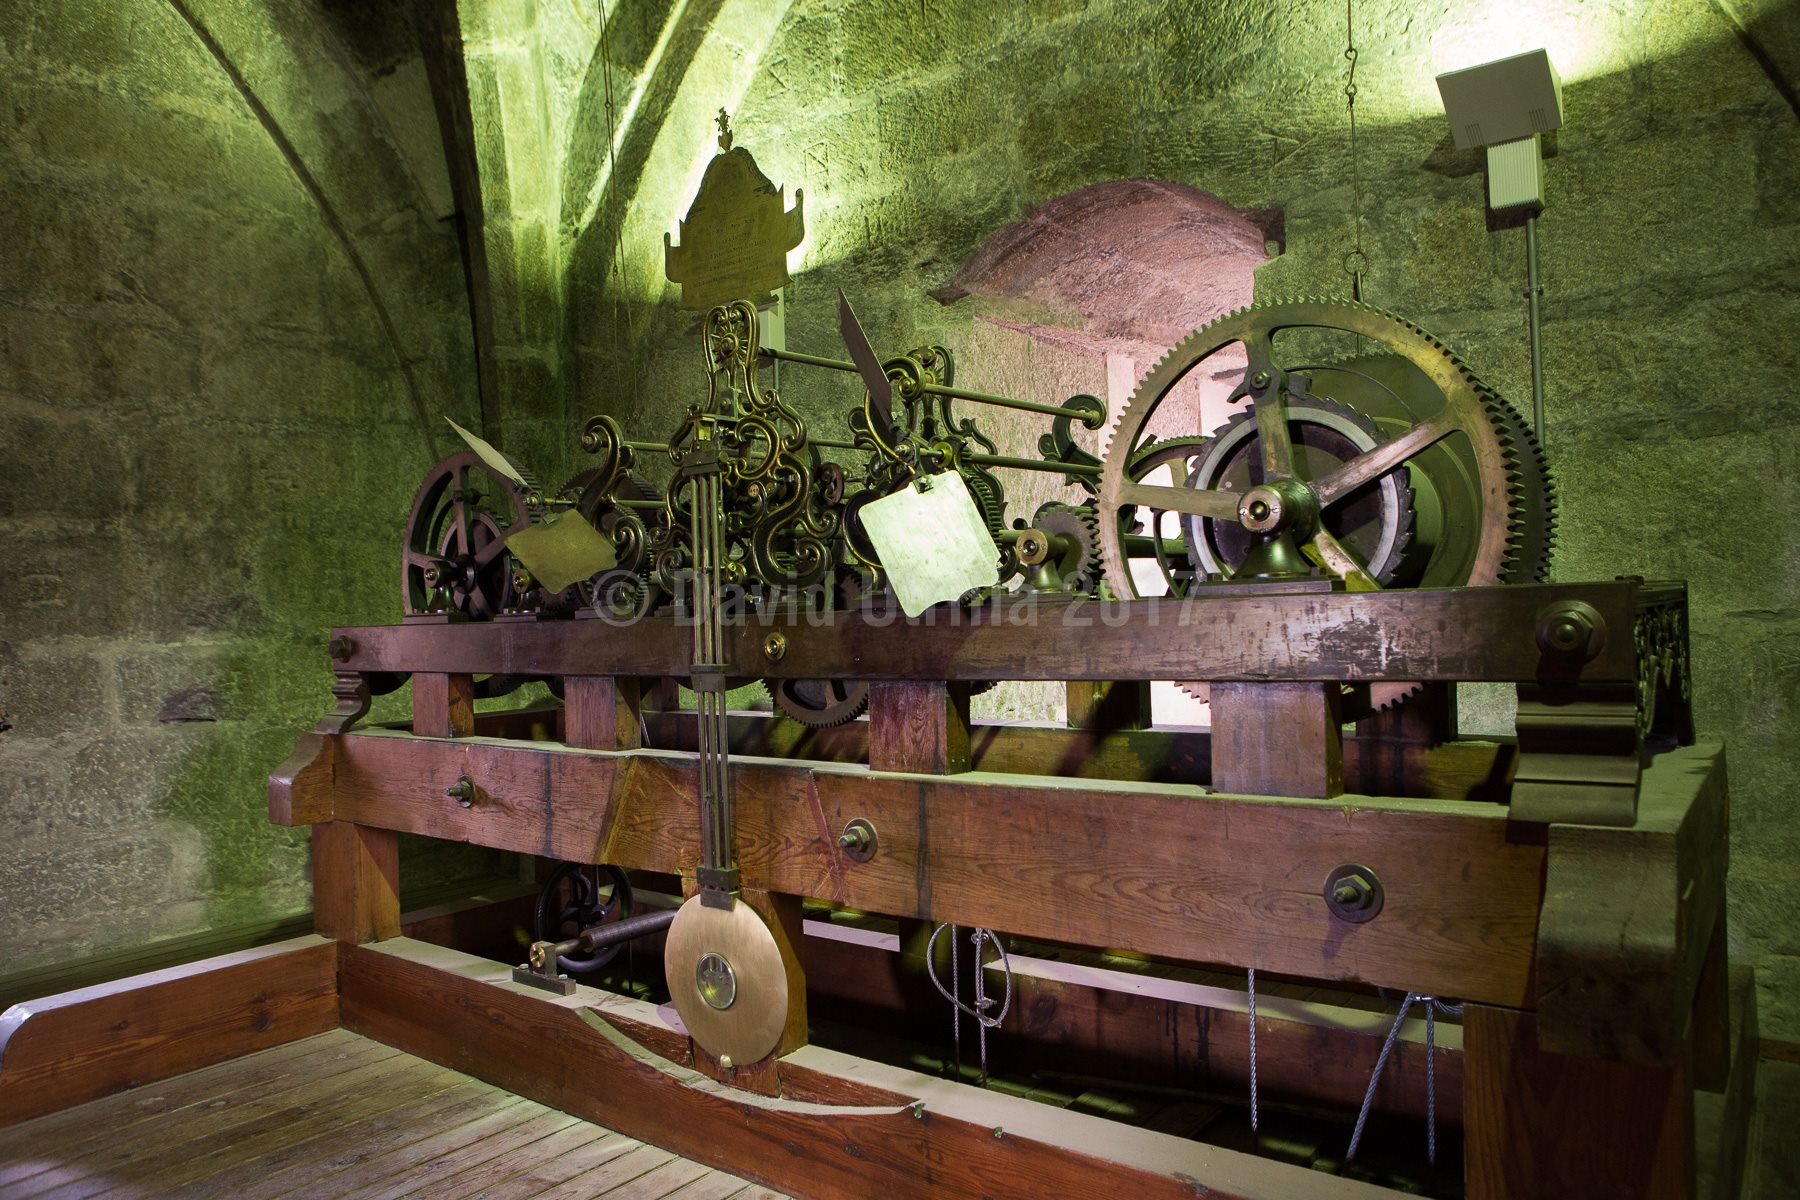 Mecanismo del reloj de la torre de la Catedral de Toledo